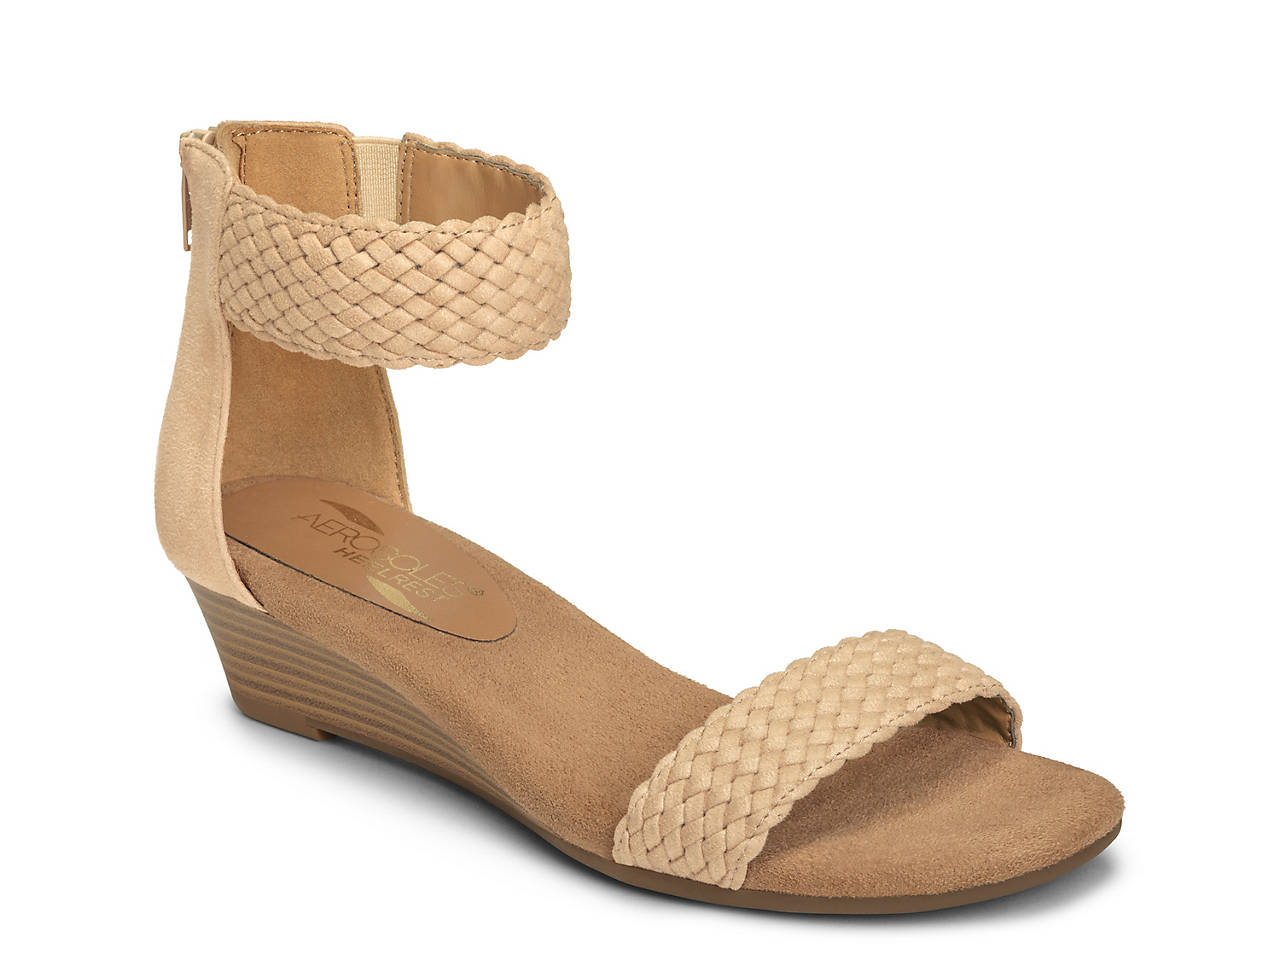 Aerosoles Yetroactive Wedge Sandal Womens Shoes